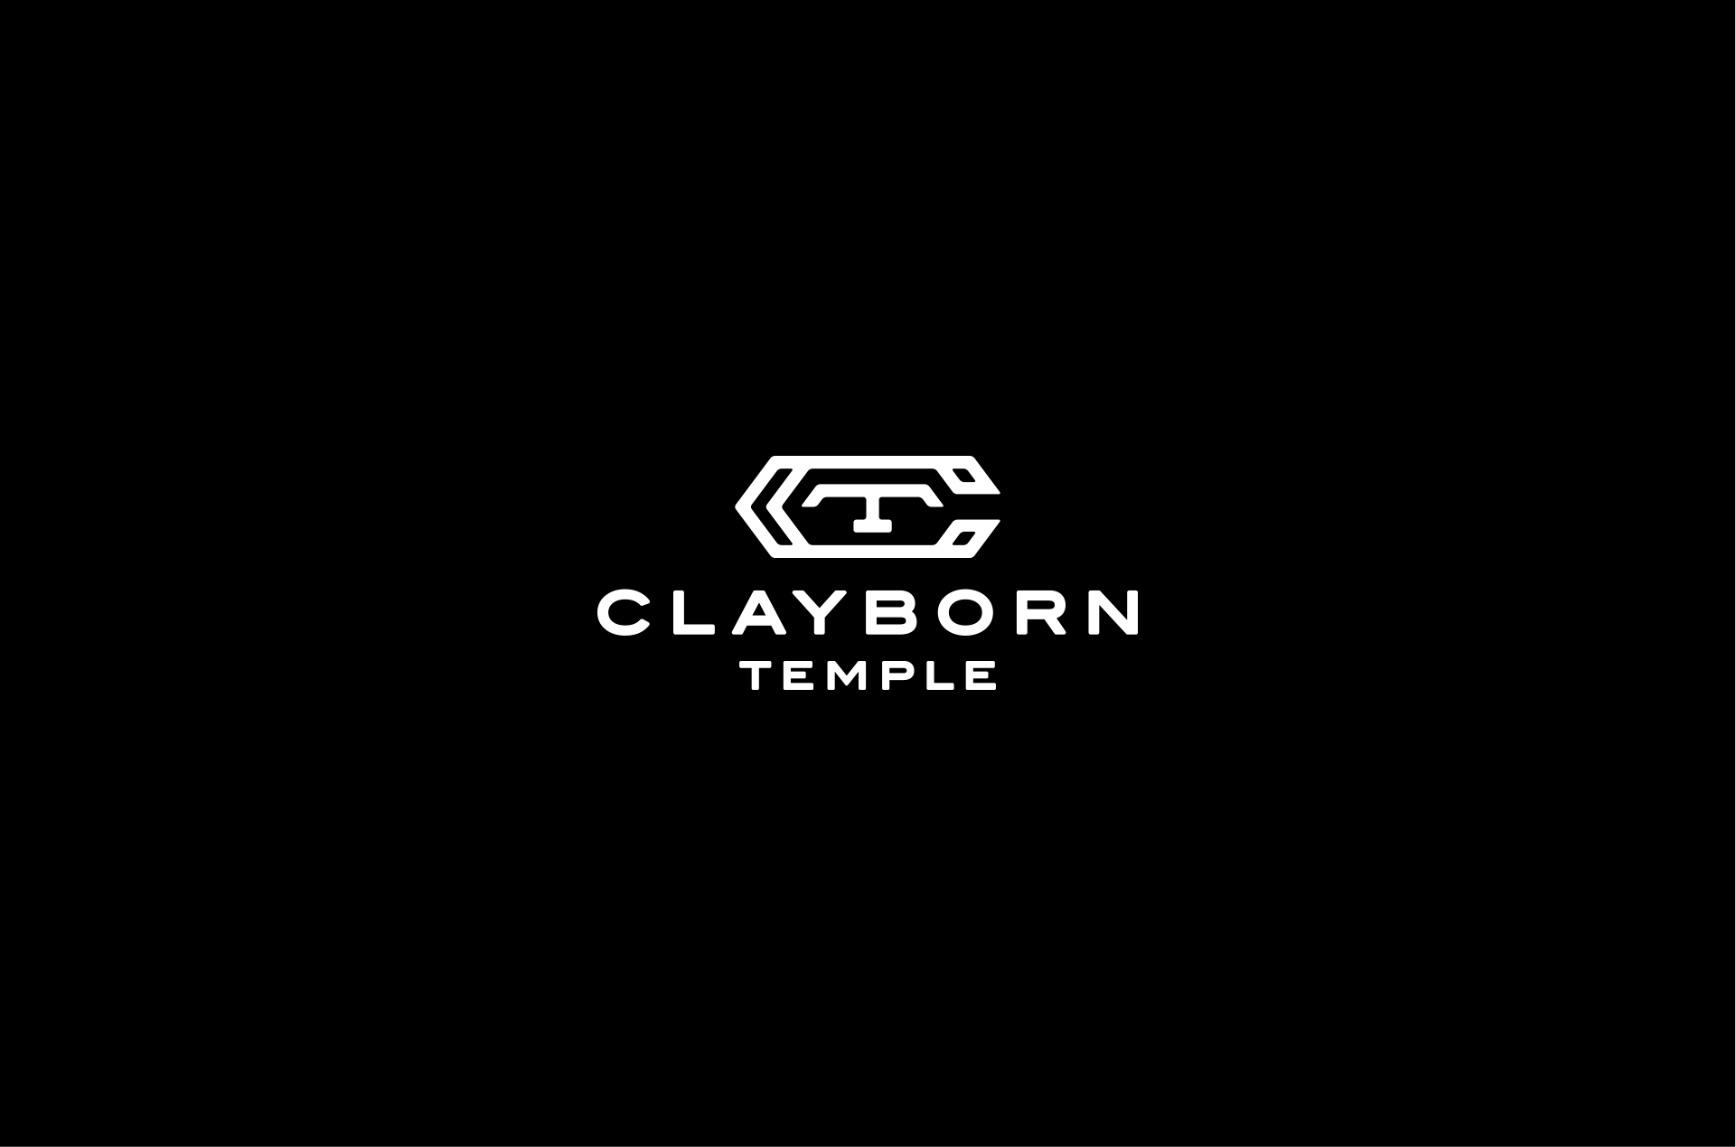 clayborn_temple_04.jpg